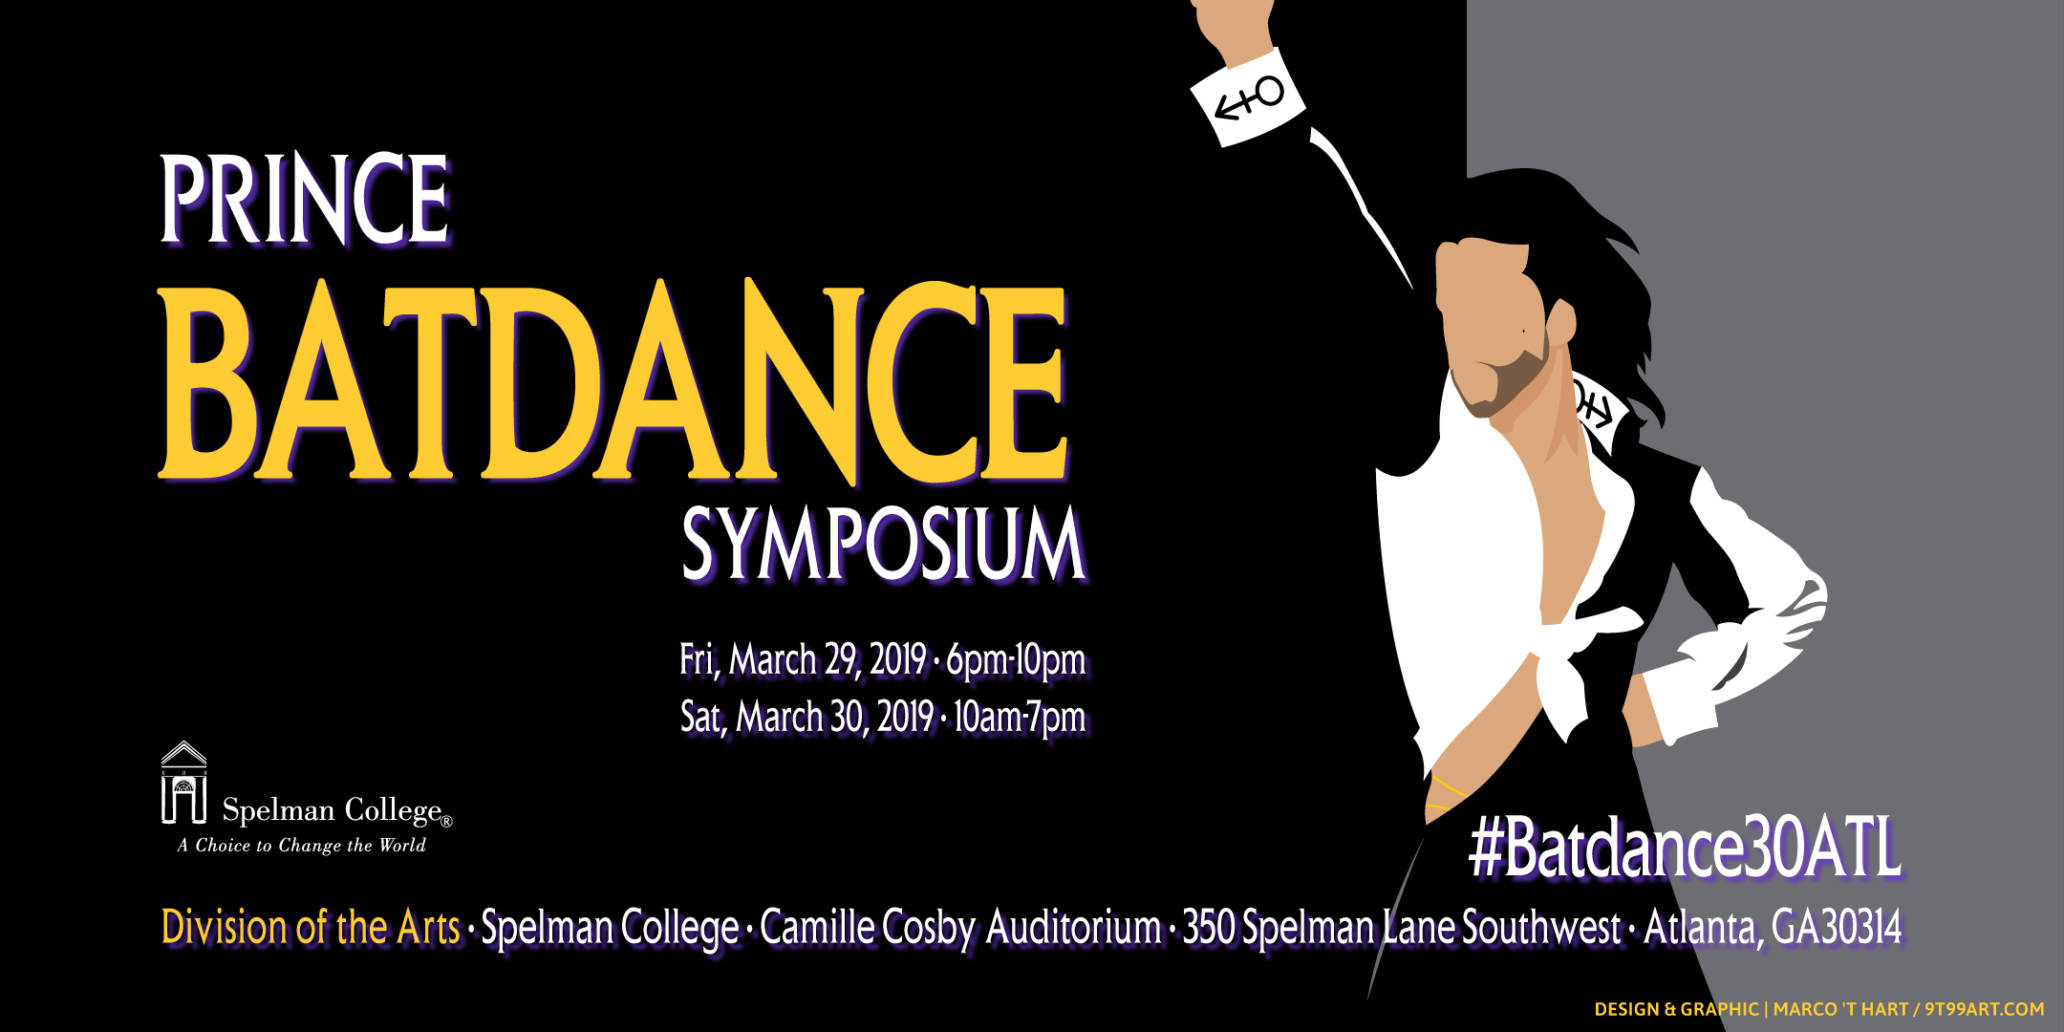 #Batdance30ATL Symposium (2019)